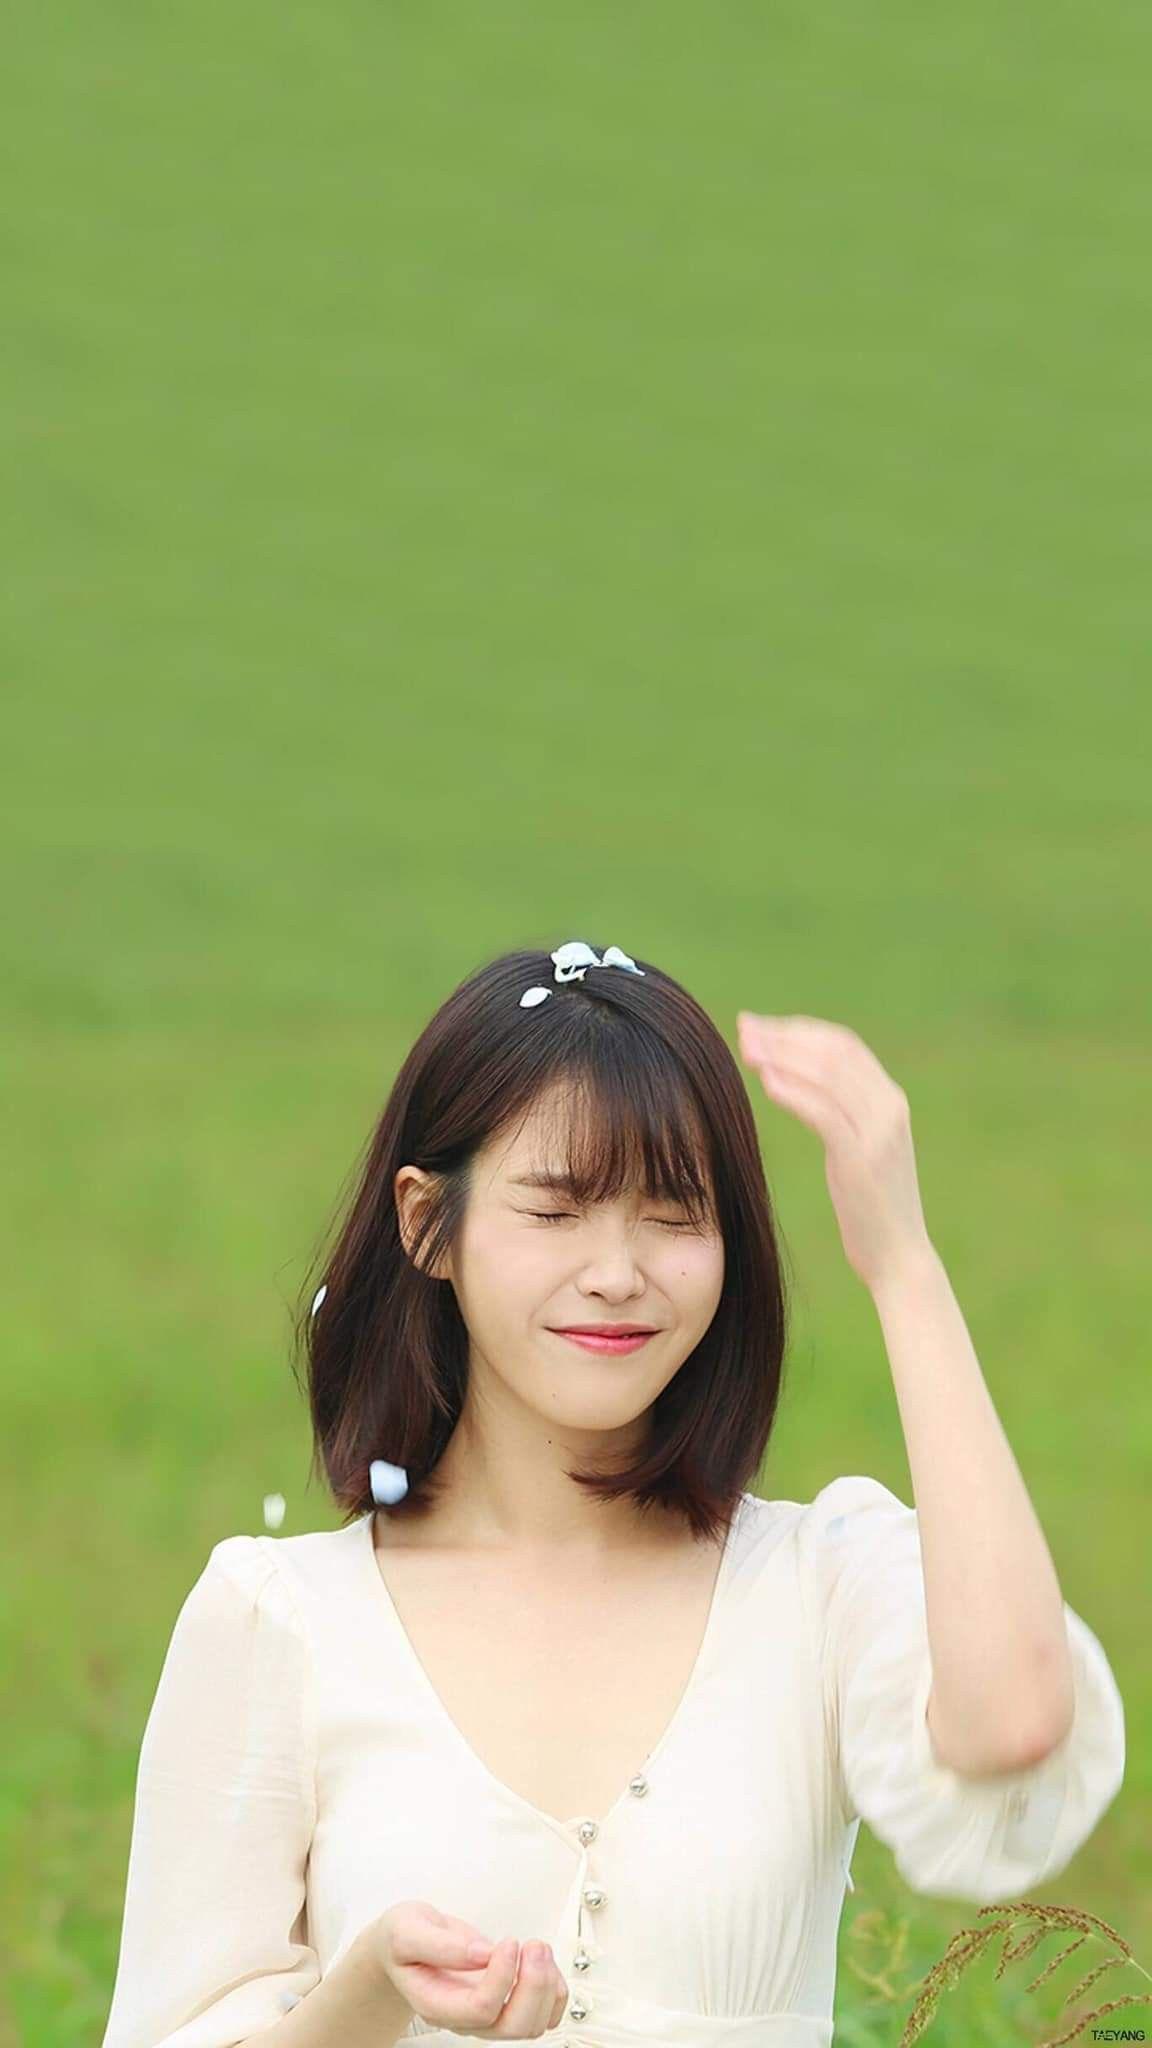 Iu Short Hair Iu Short Hair In 2020 Iu Short Hair Korean Hairstyle Short Hair Styles